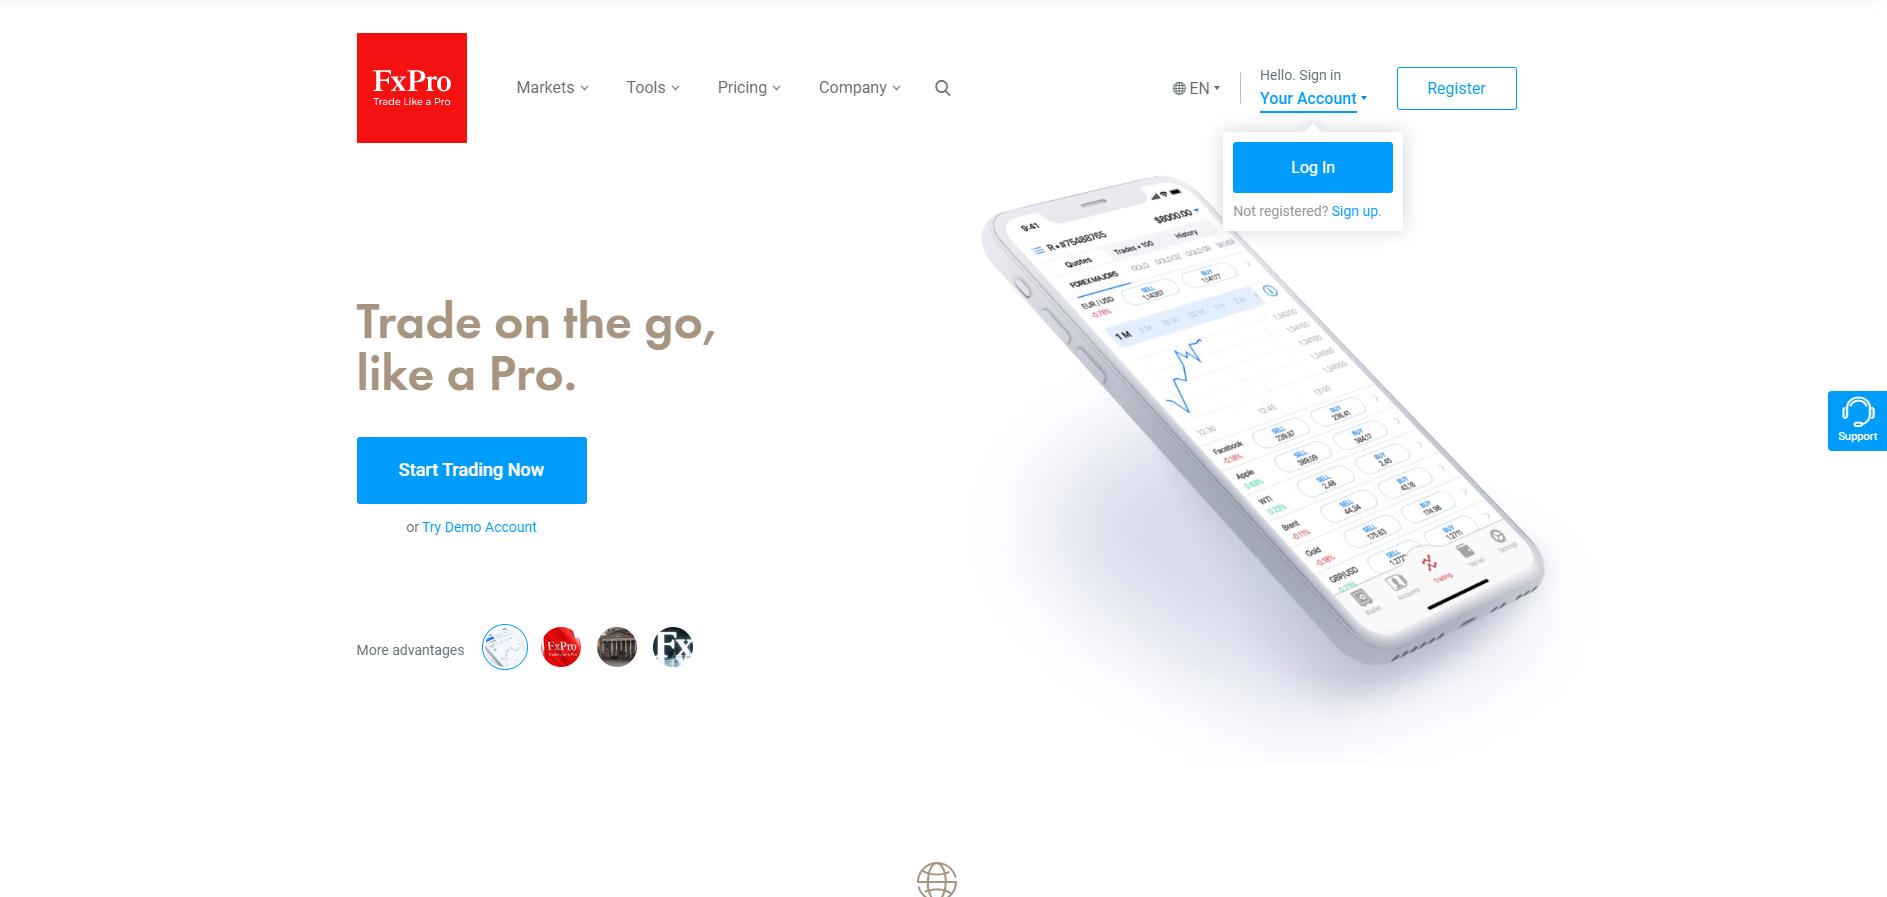 Oficjalna strona platformy forex FxPro